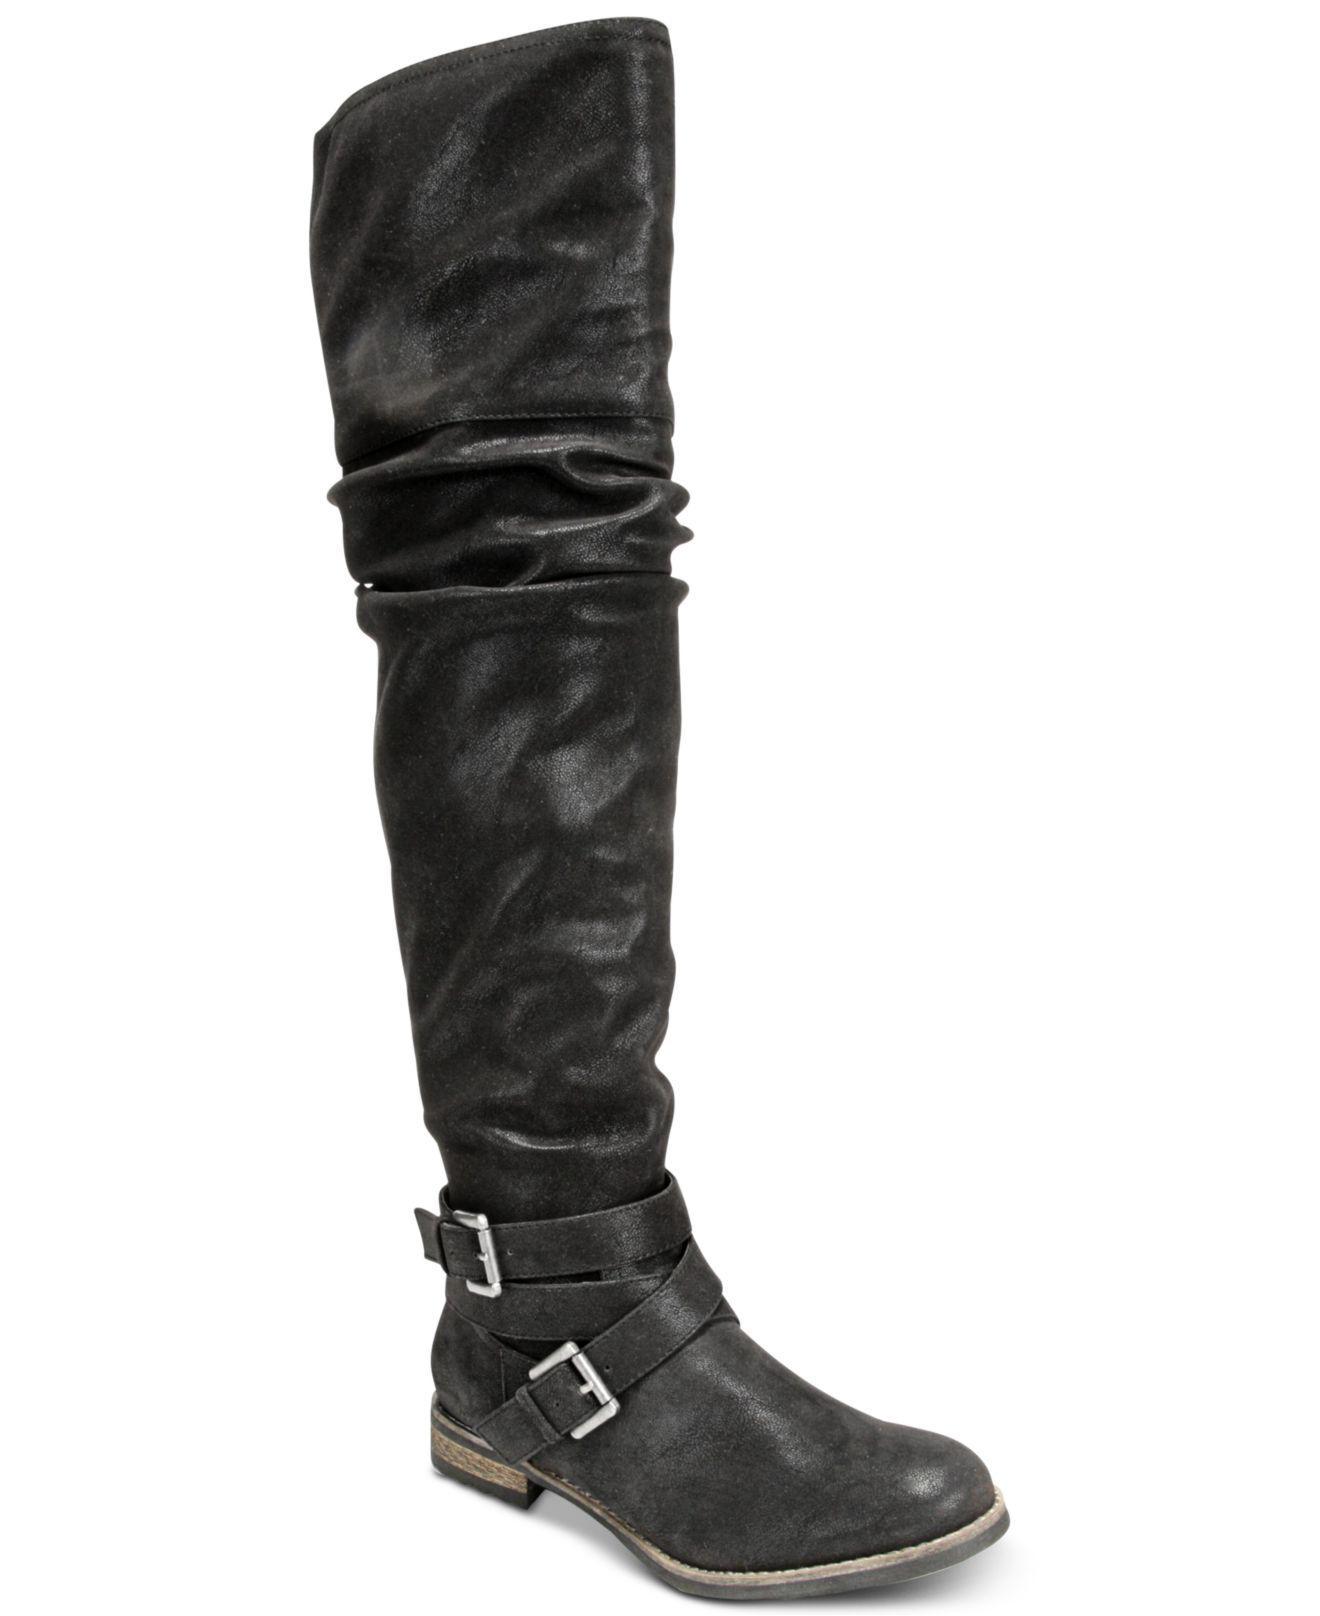 Carlos by Carlos Santana Nina Over-The-Knee BOOTS Size 5.5 M Black